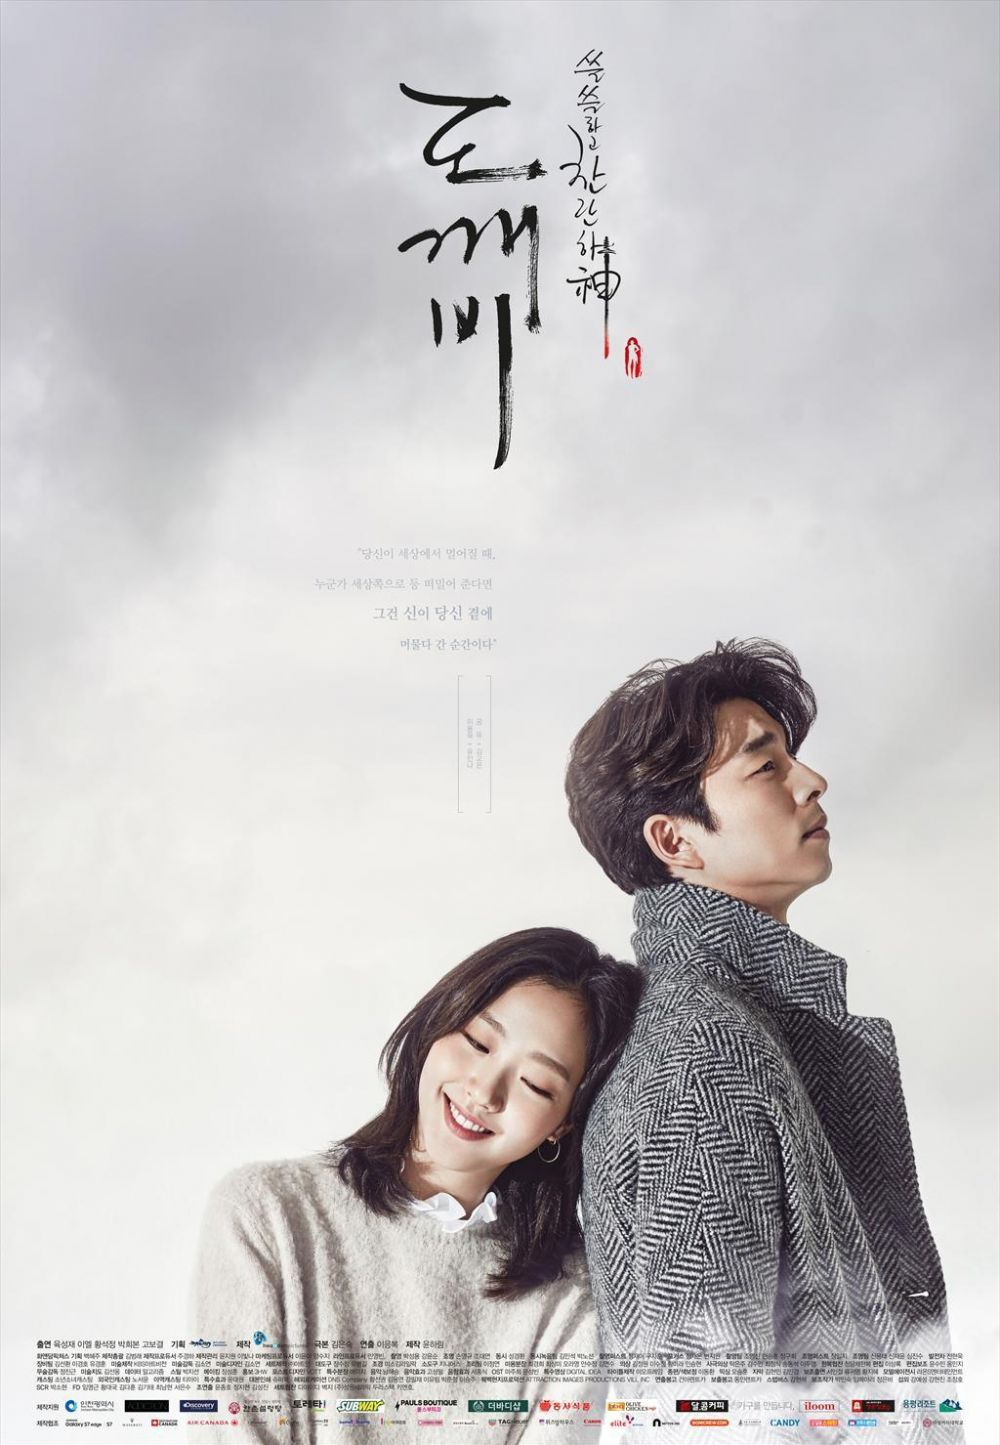 drama Korea fantasi komedi asianwiki